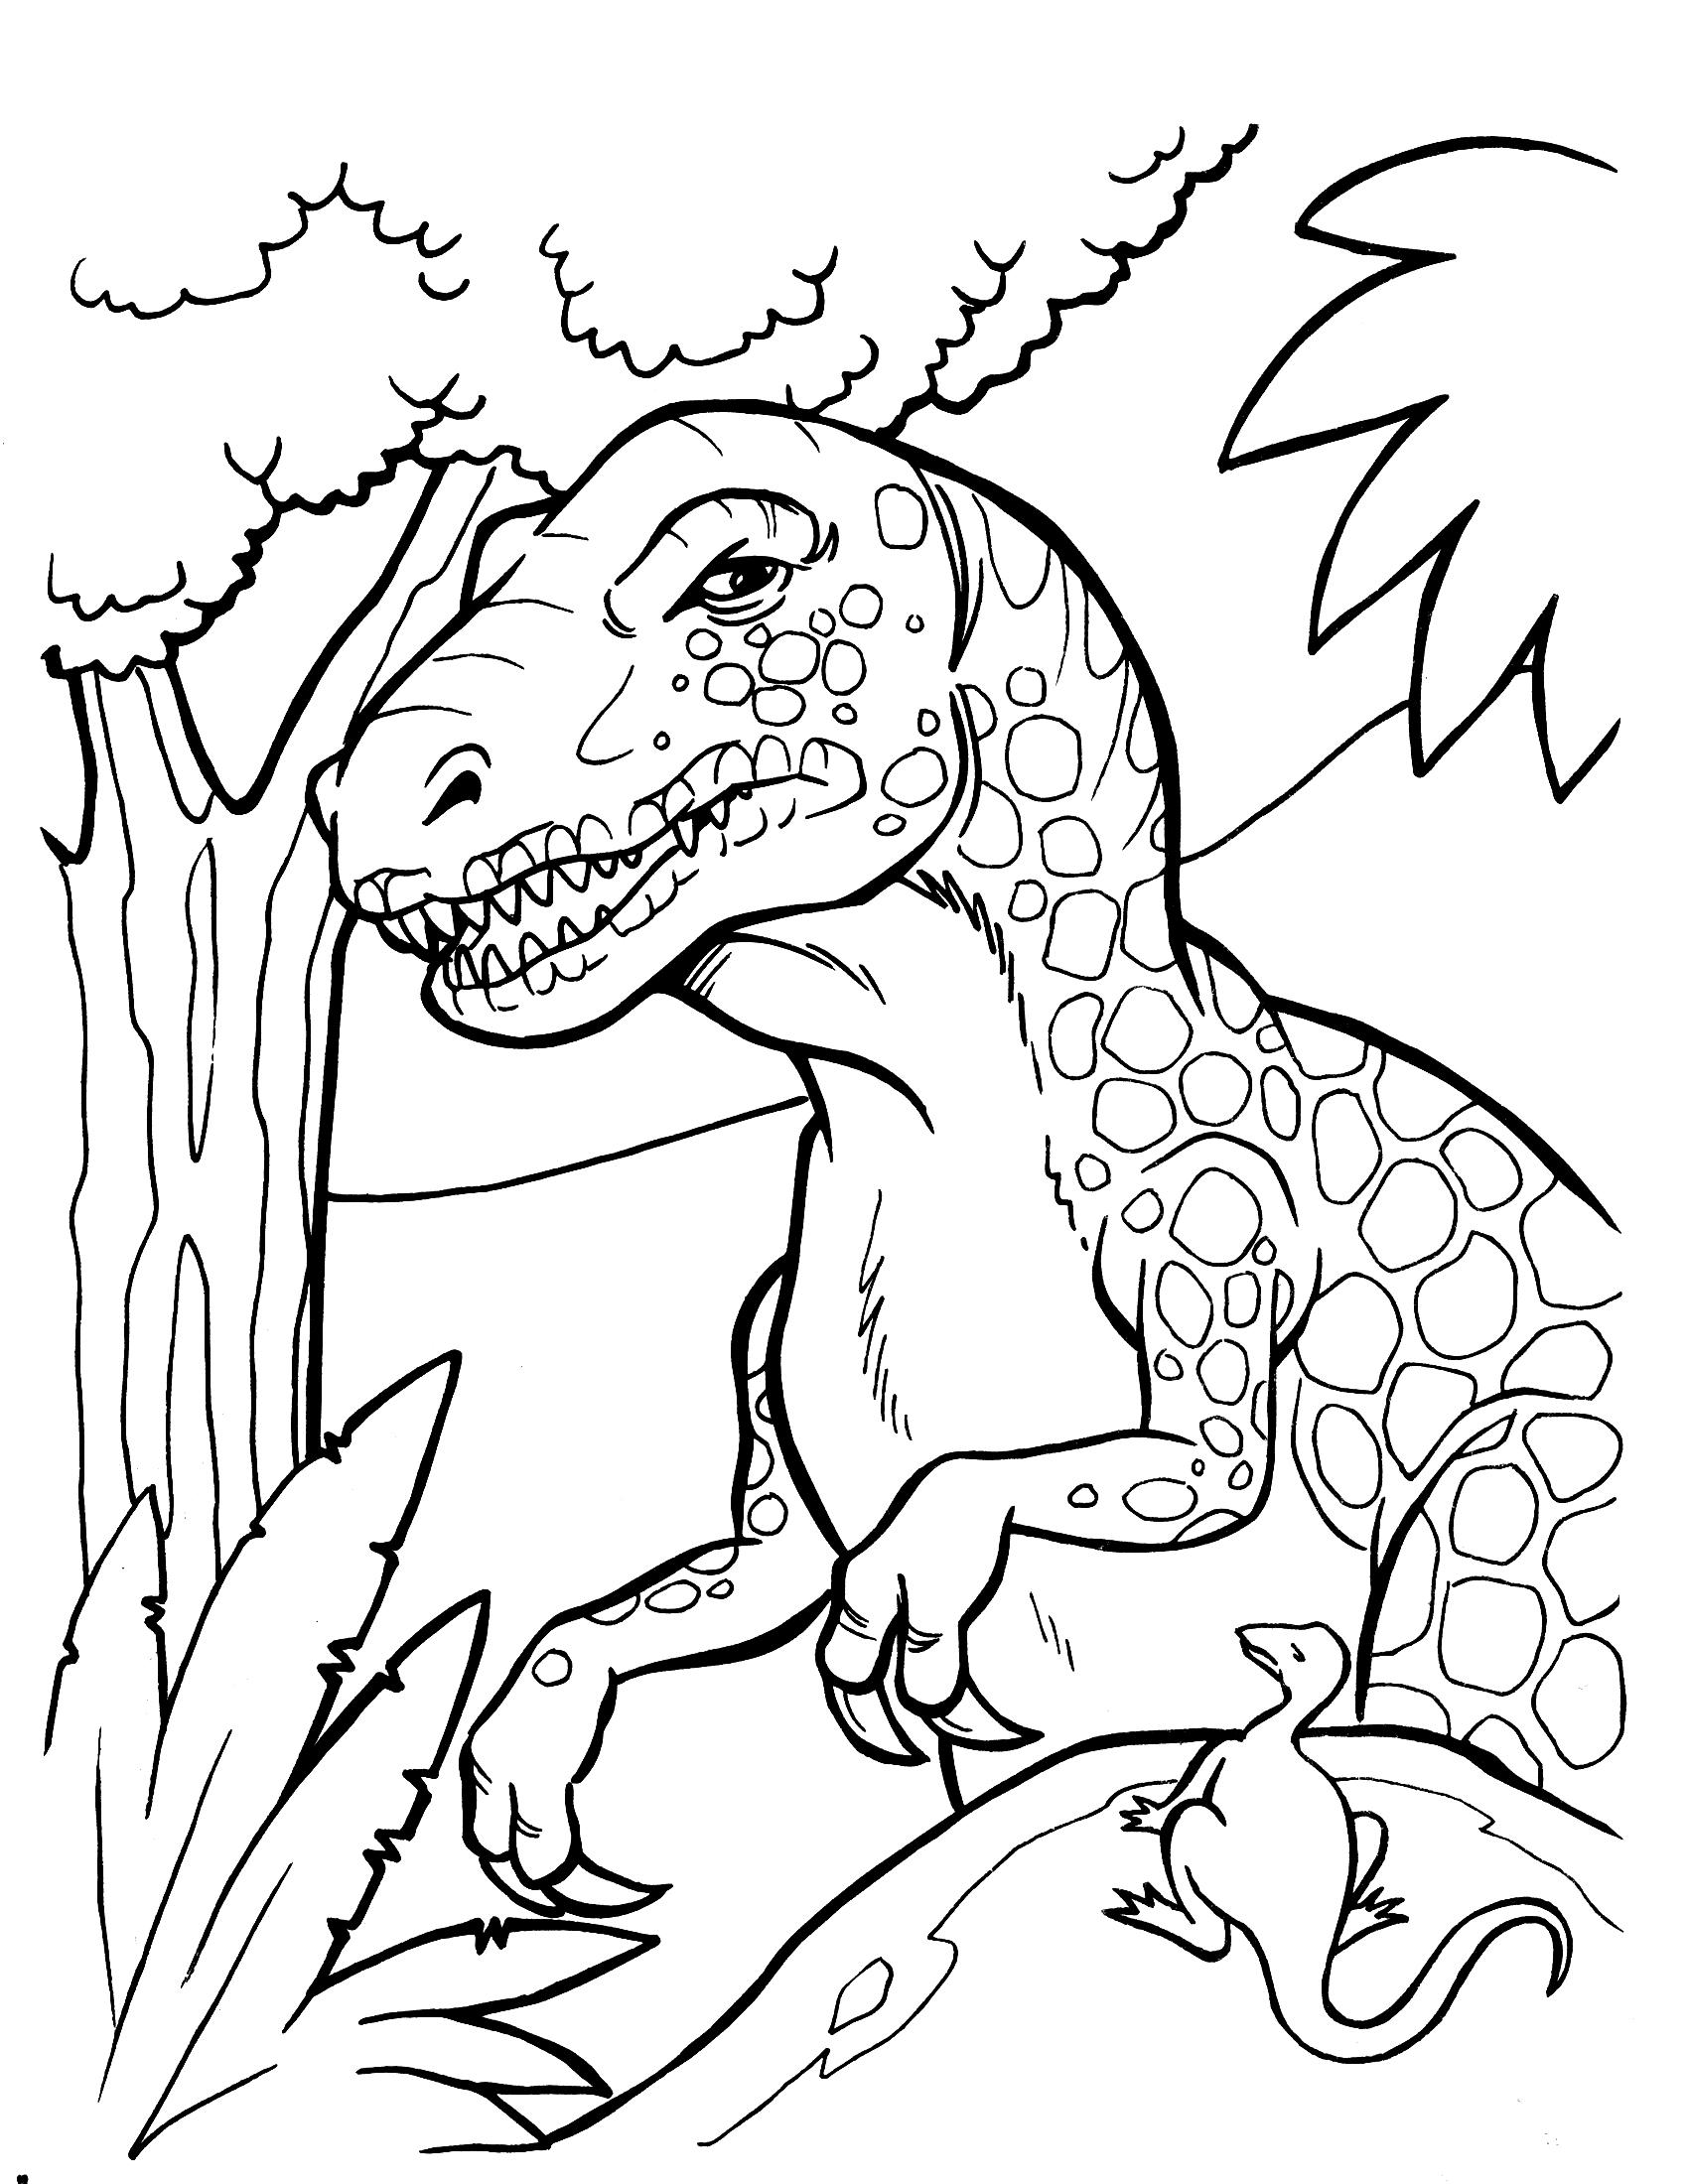 print dinosaur coloring pages free printable dinosaur coloring pages for kids coloring pages print dinosaur